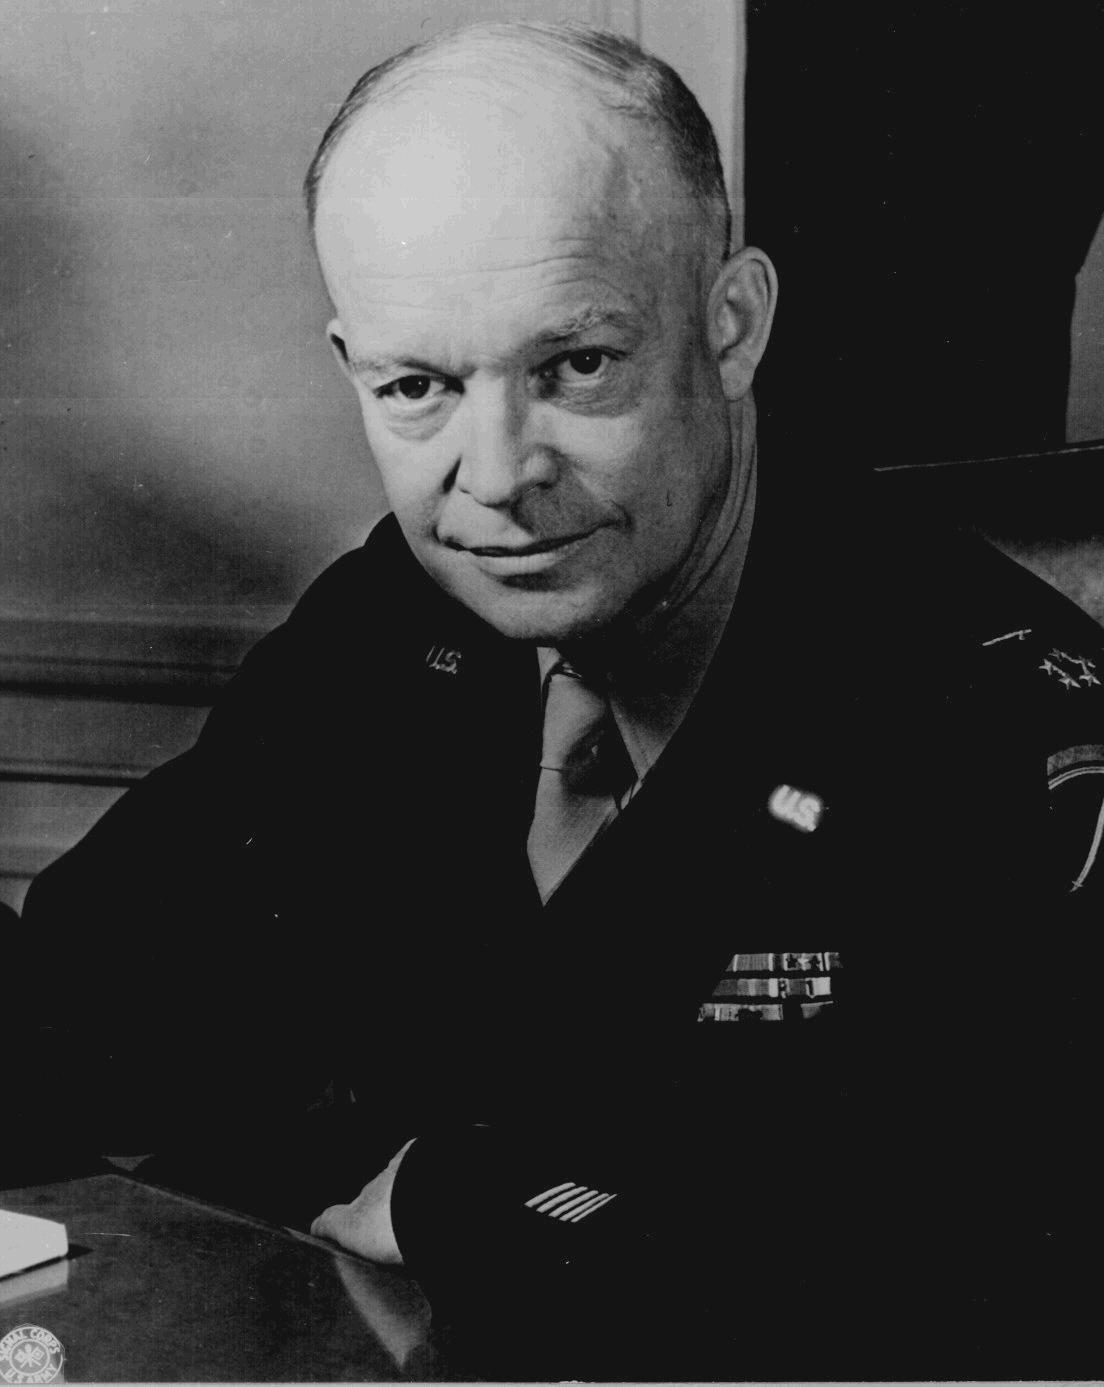 02-Dwight-D-Eisenhower-Supreme-Allied-Commander-World-War-II.jpg